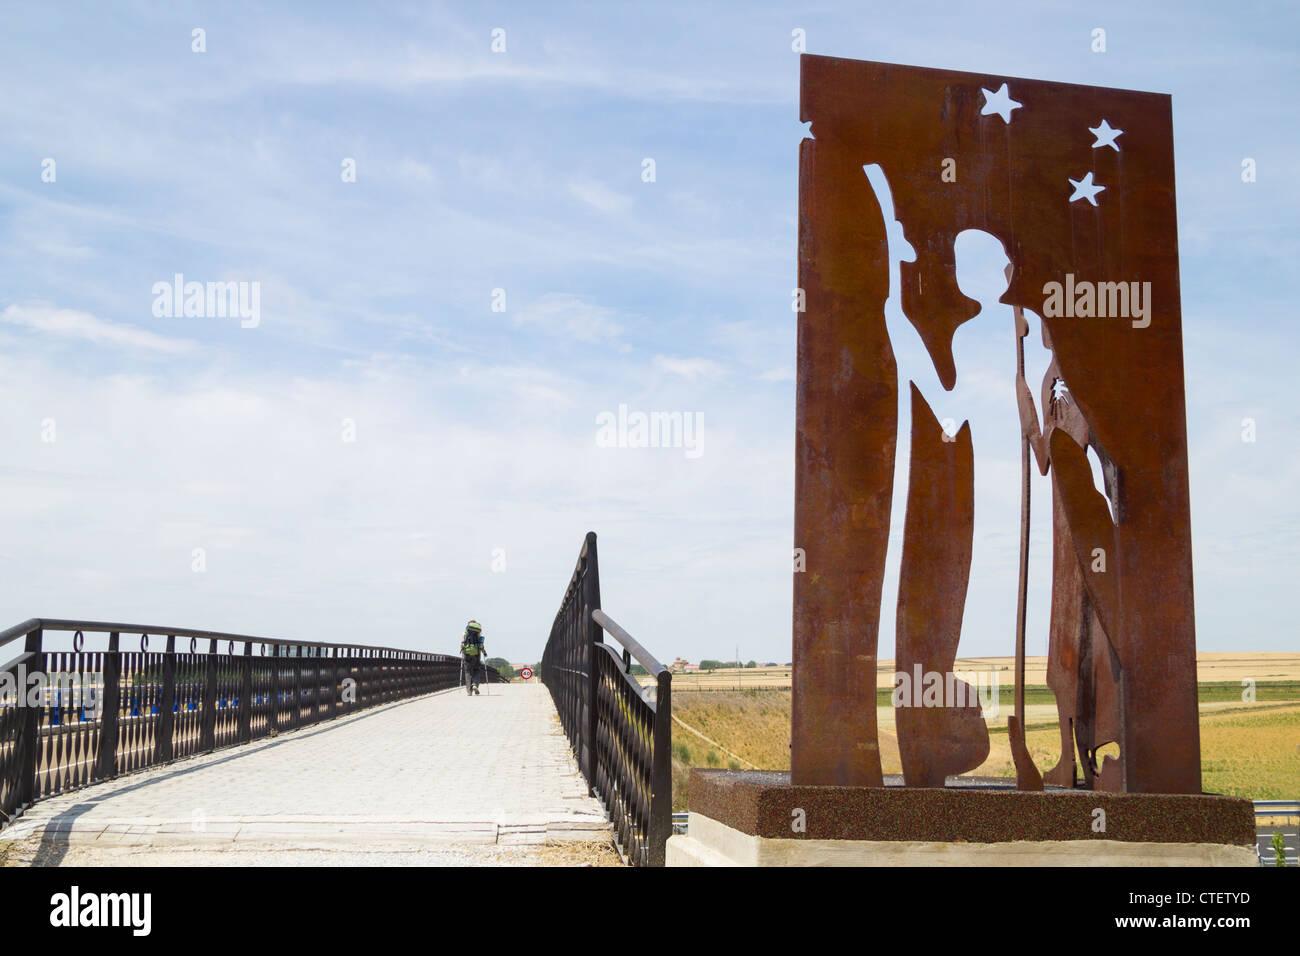 Pilgrim walking Camino de Santiago near metal Camino de Santiago sculpture in Fromista, Palencia province, Spain - Stock Image